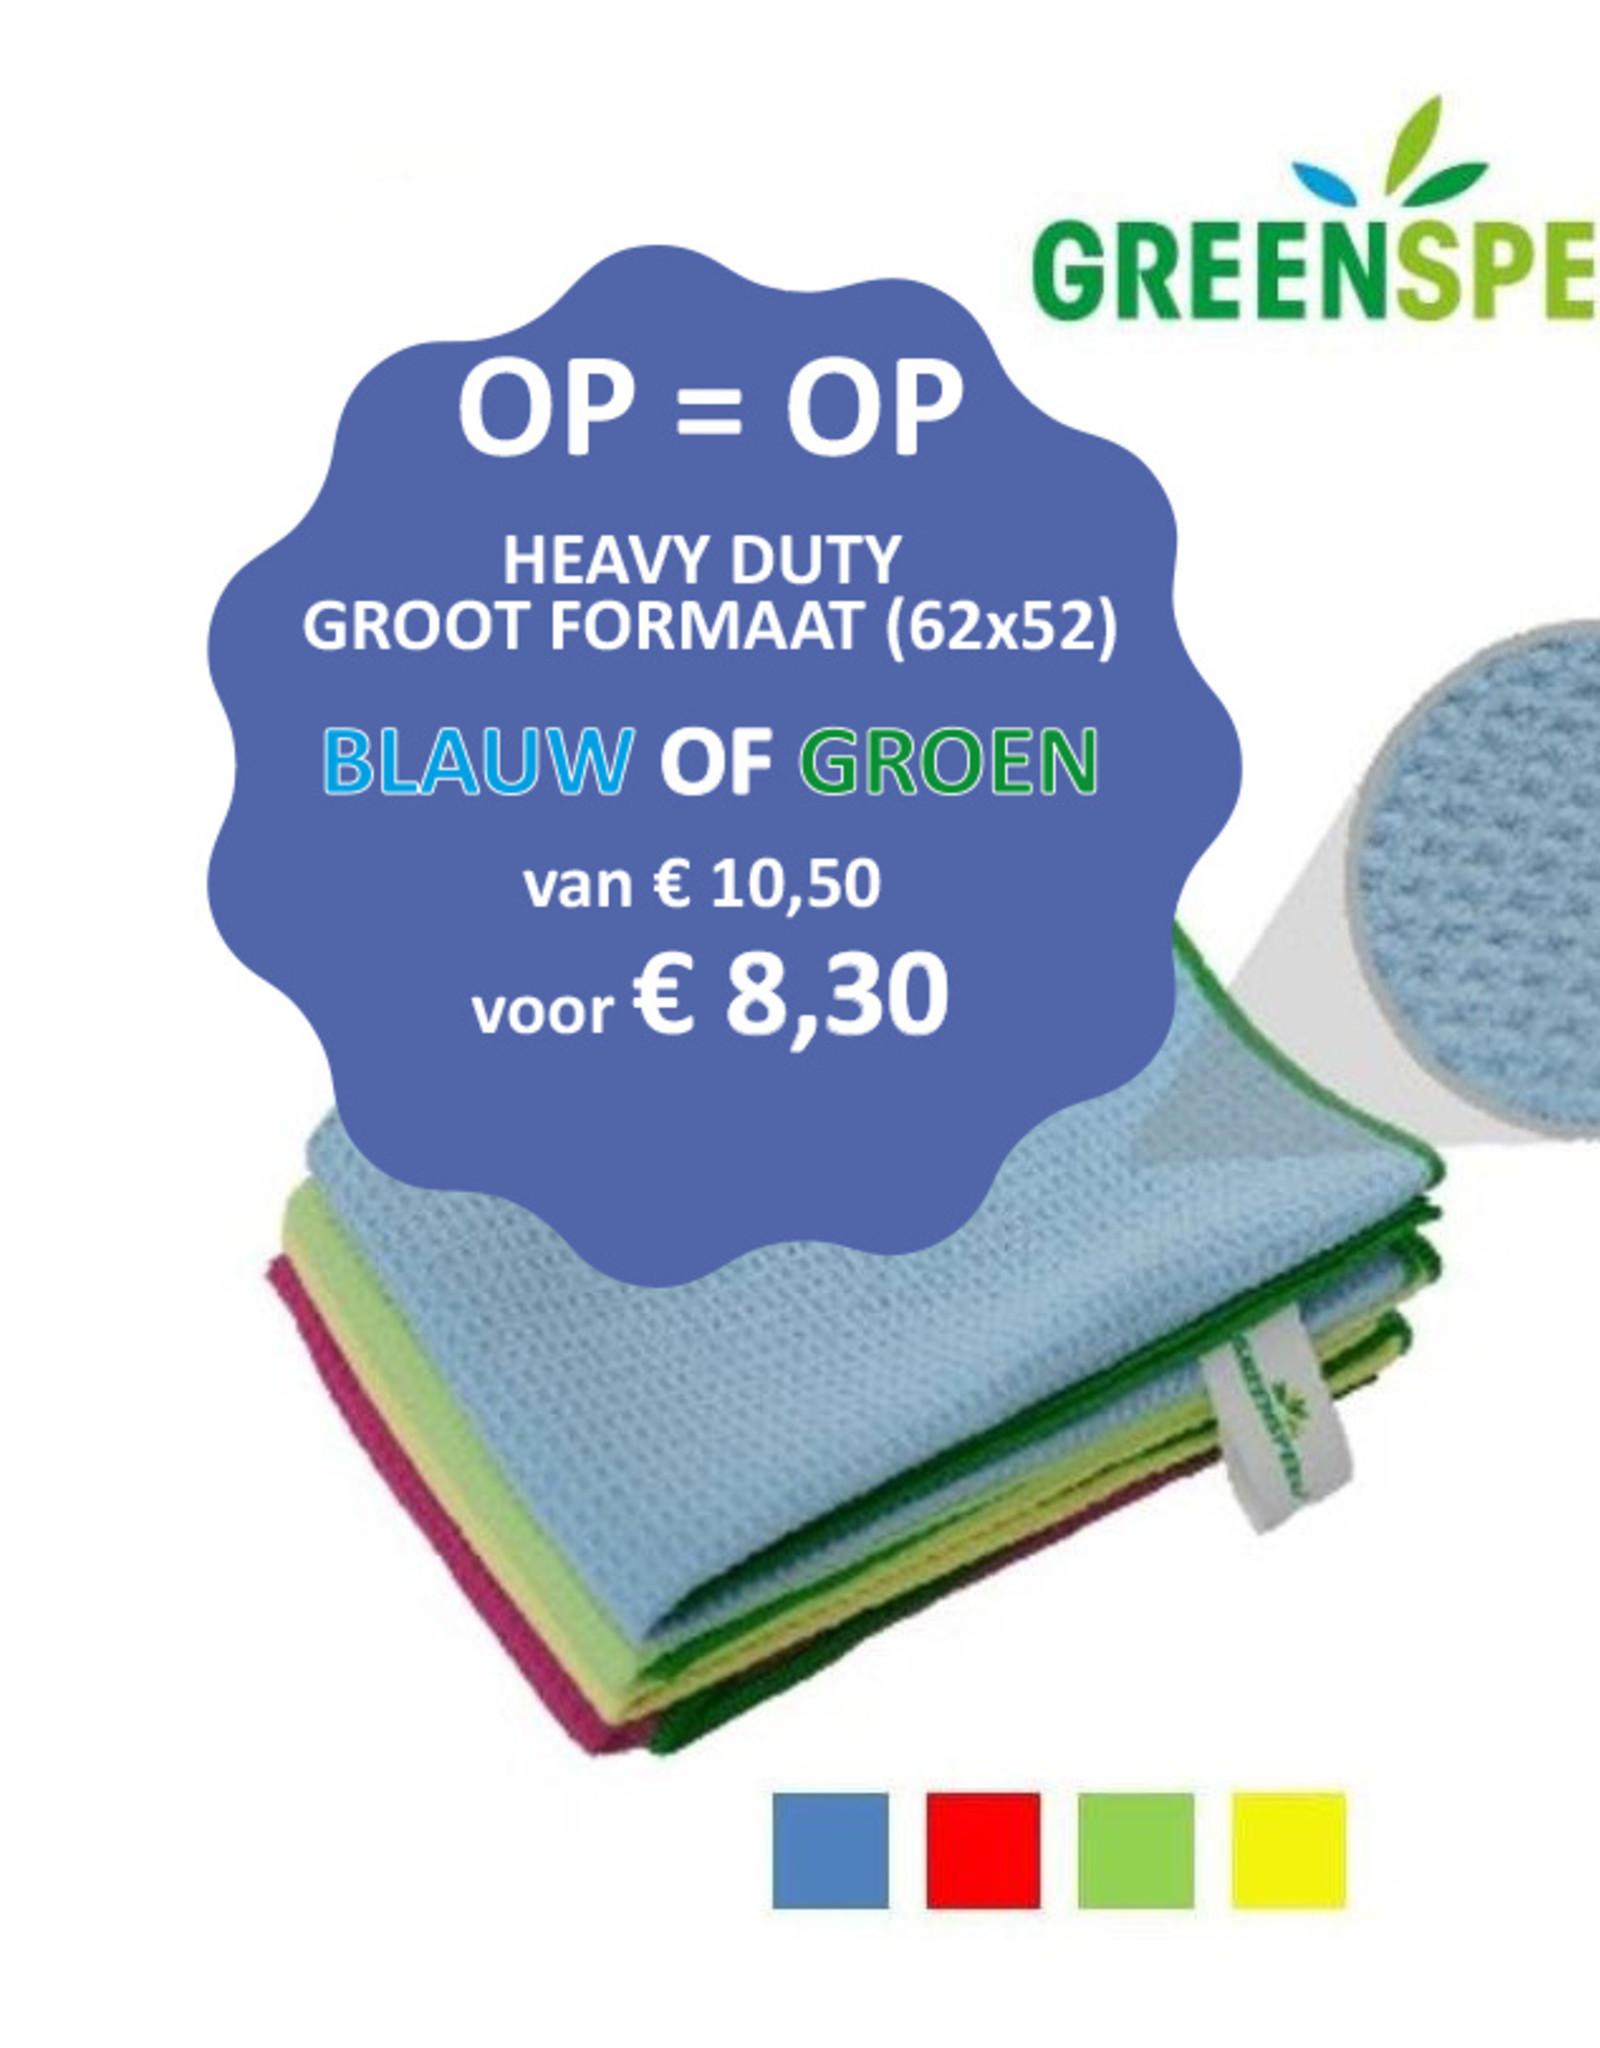 Greenspeed HD doek 62 x 52 cm, de ouderwetse 'wafel'-doek van microvezel